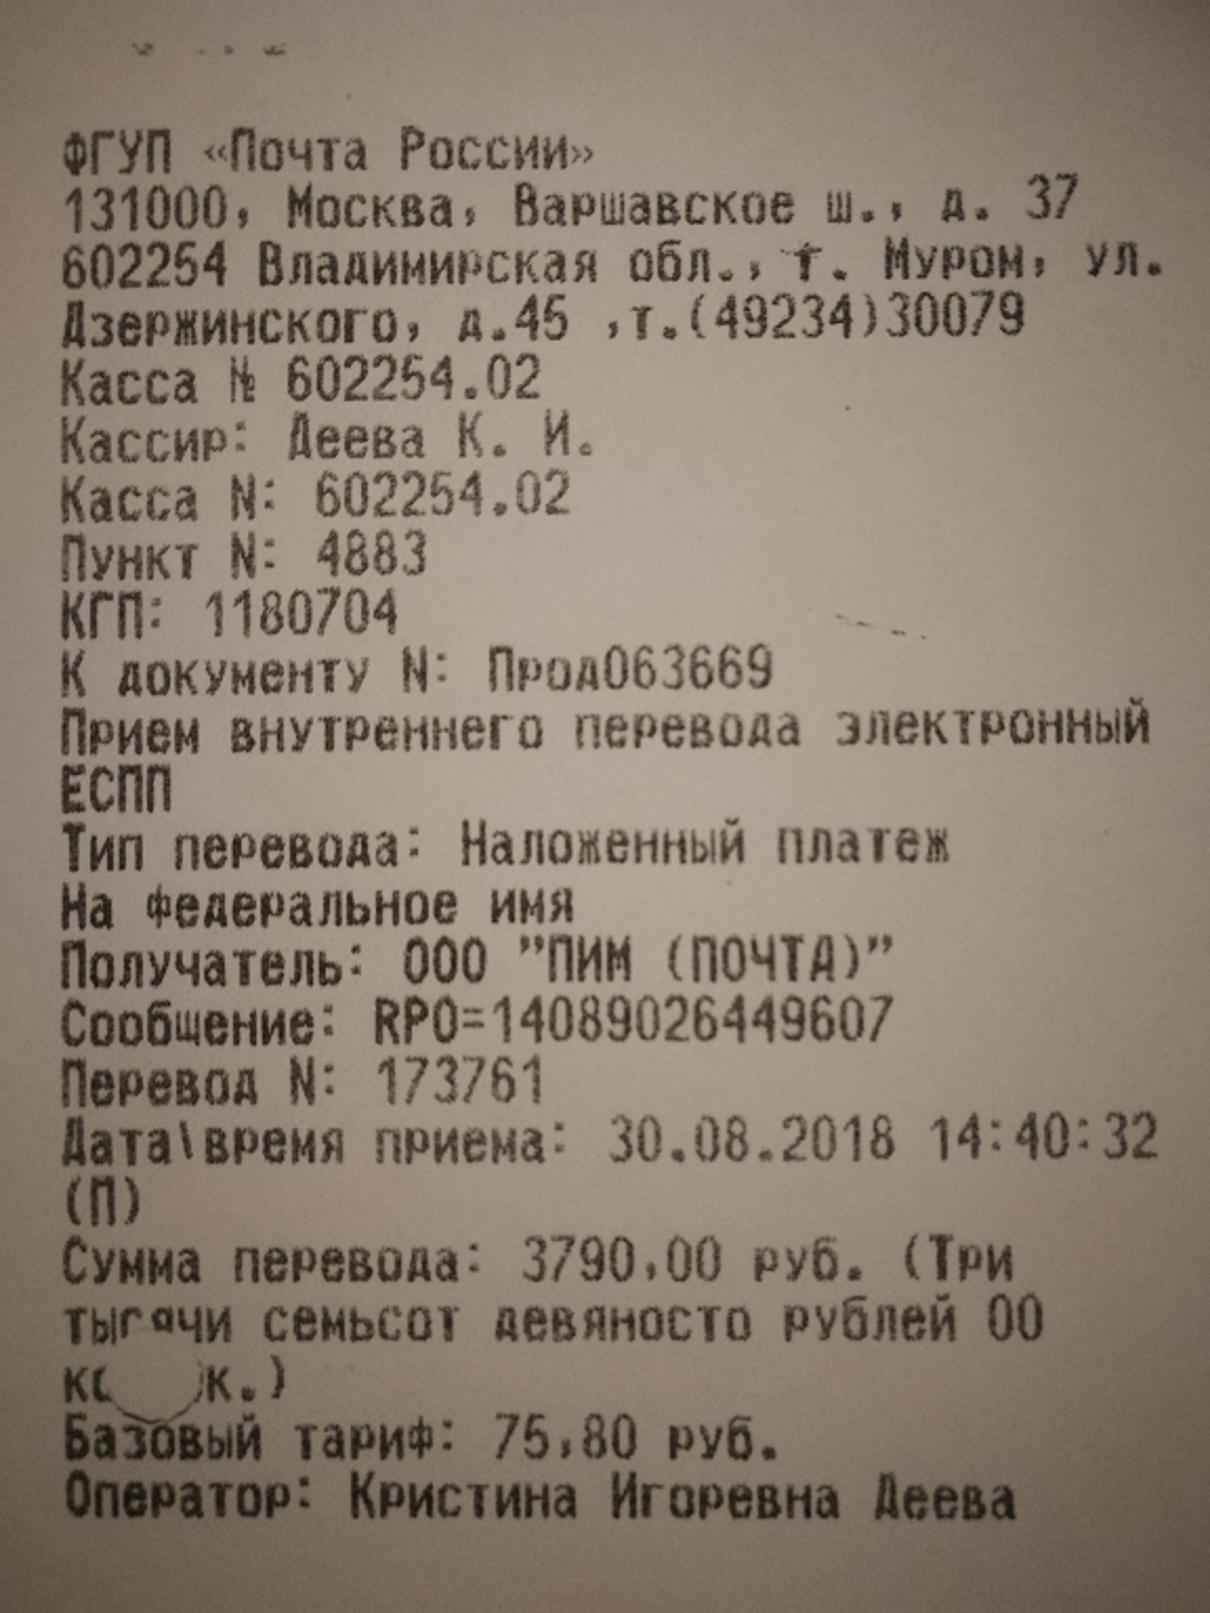 Жалоба-отзыв: Smart-deeper.ru - Пришел не тот товар